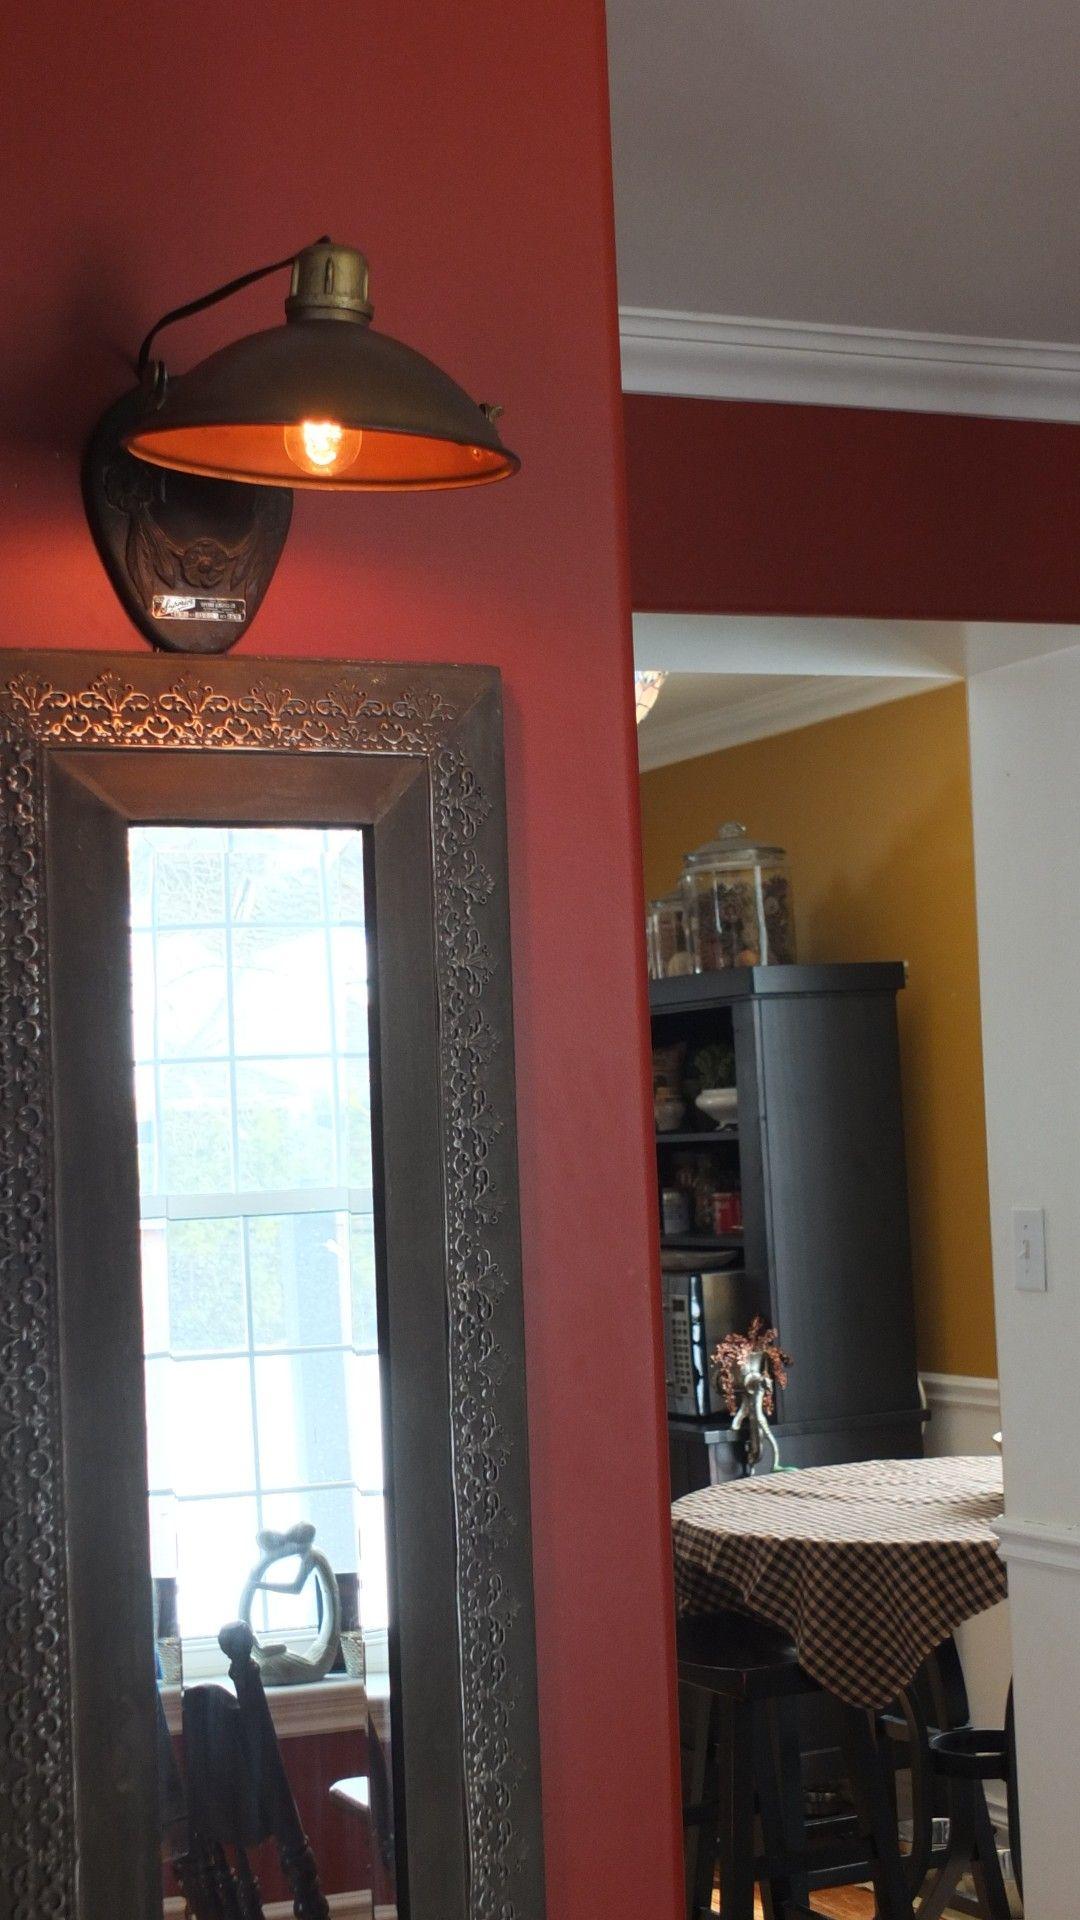 Vintage heat lamp turned wall sconce!